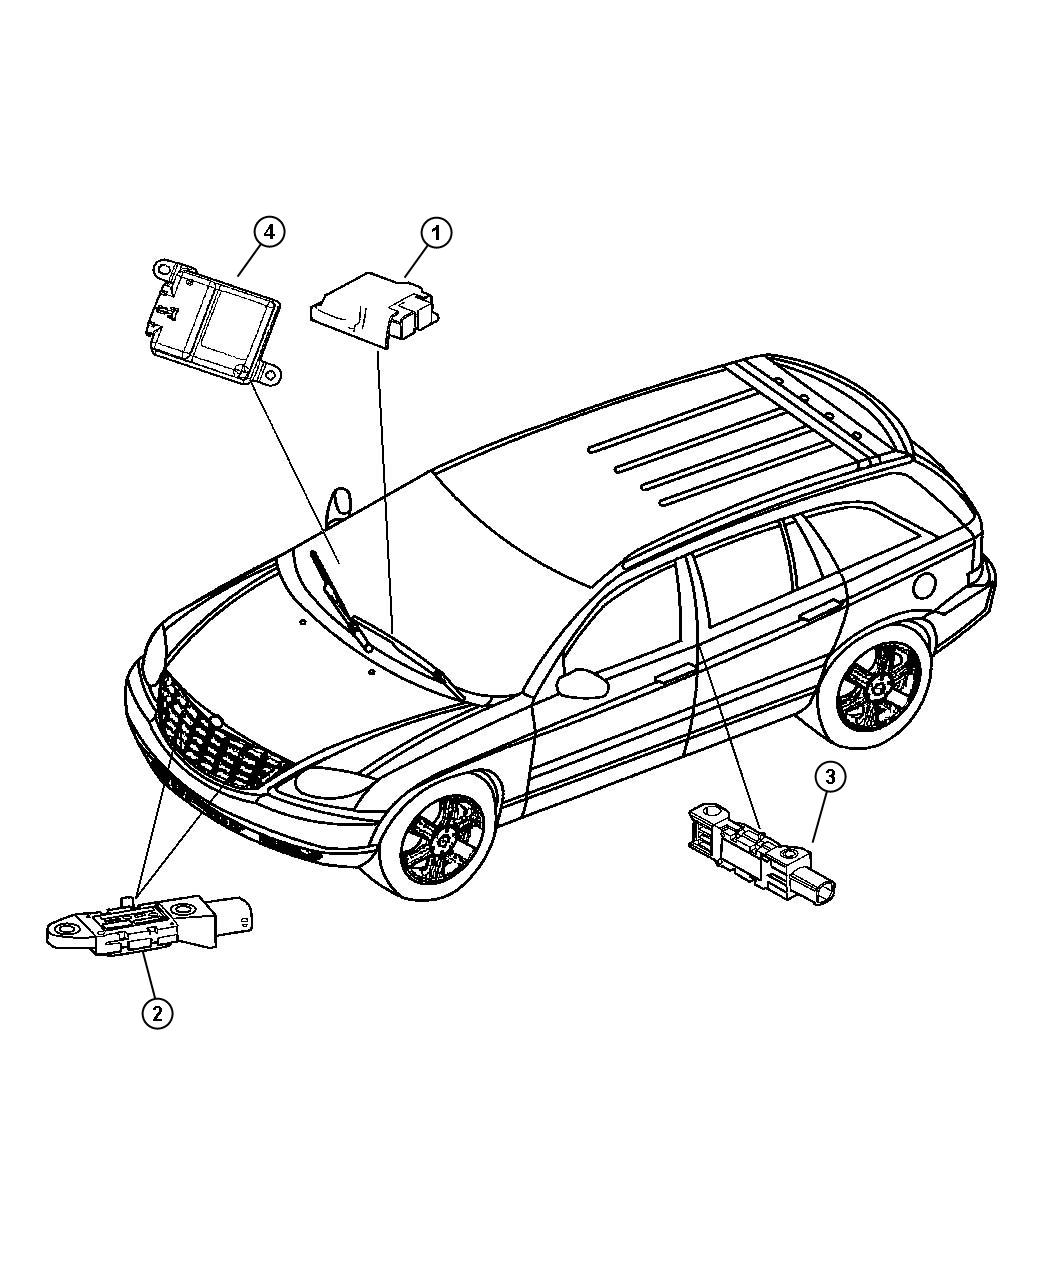 2007 Chrysler Pacifica Module. Occupant restraint. Air